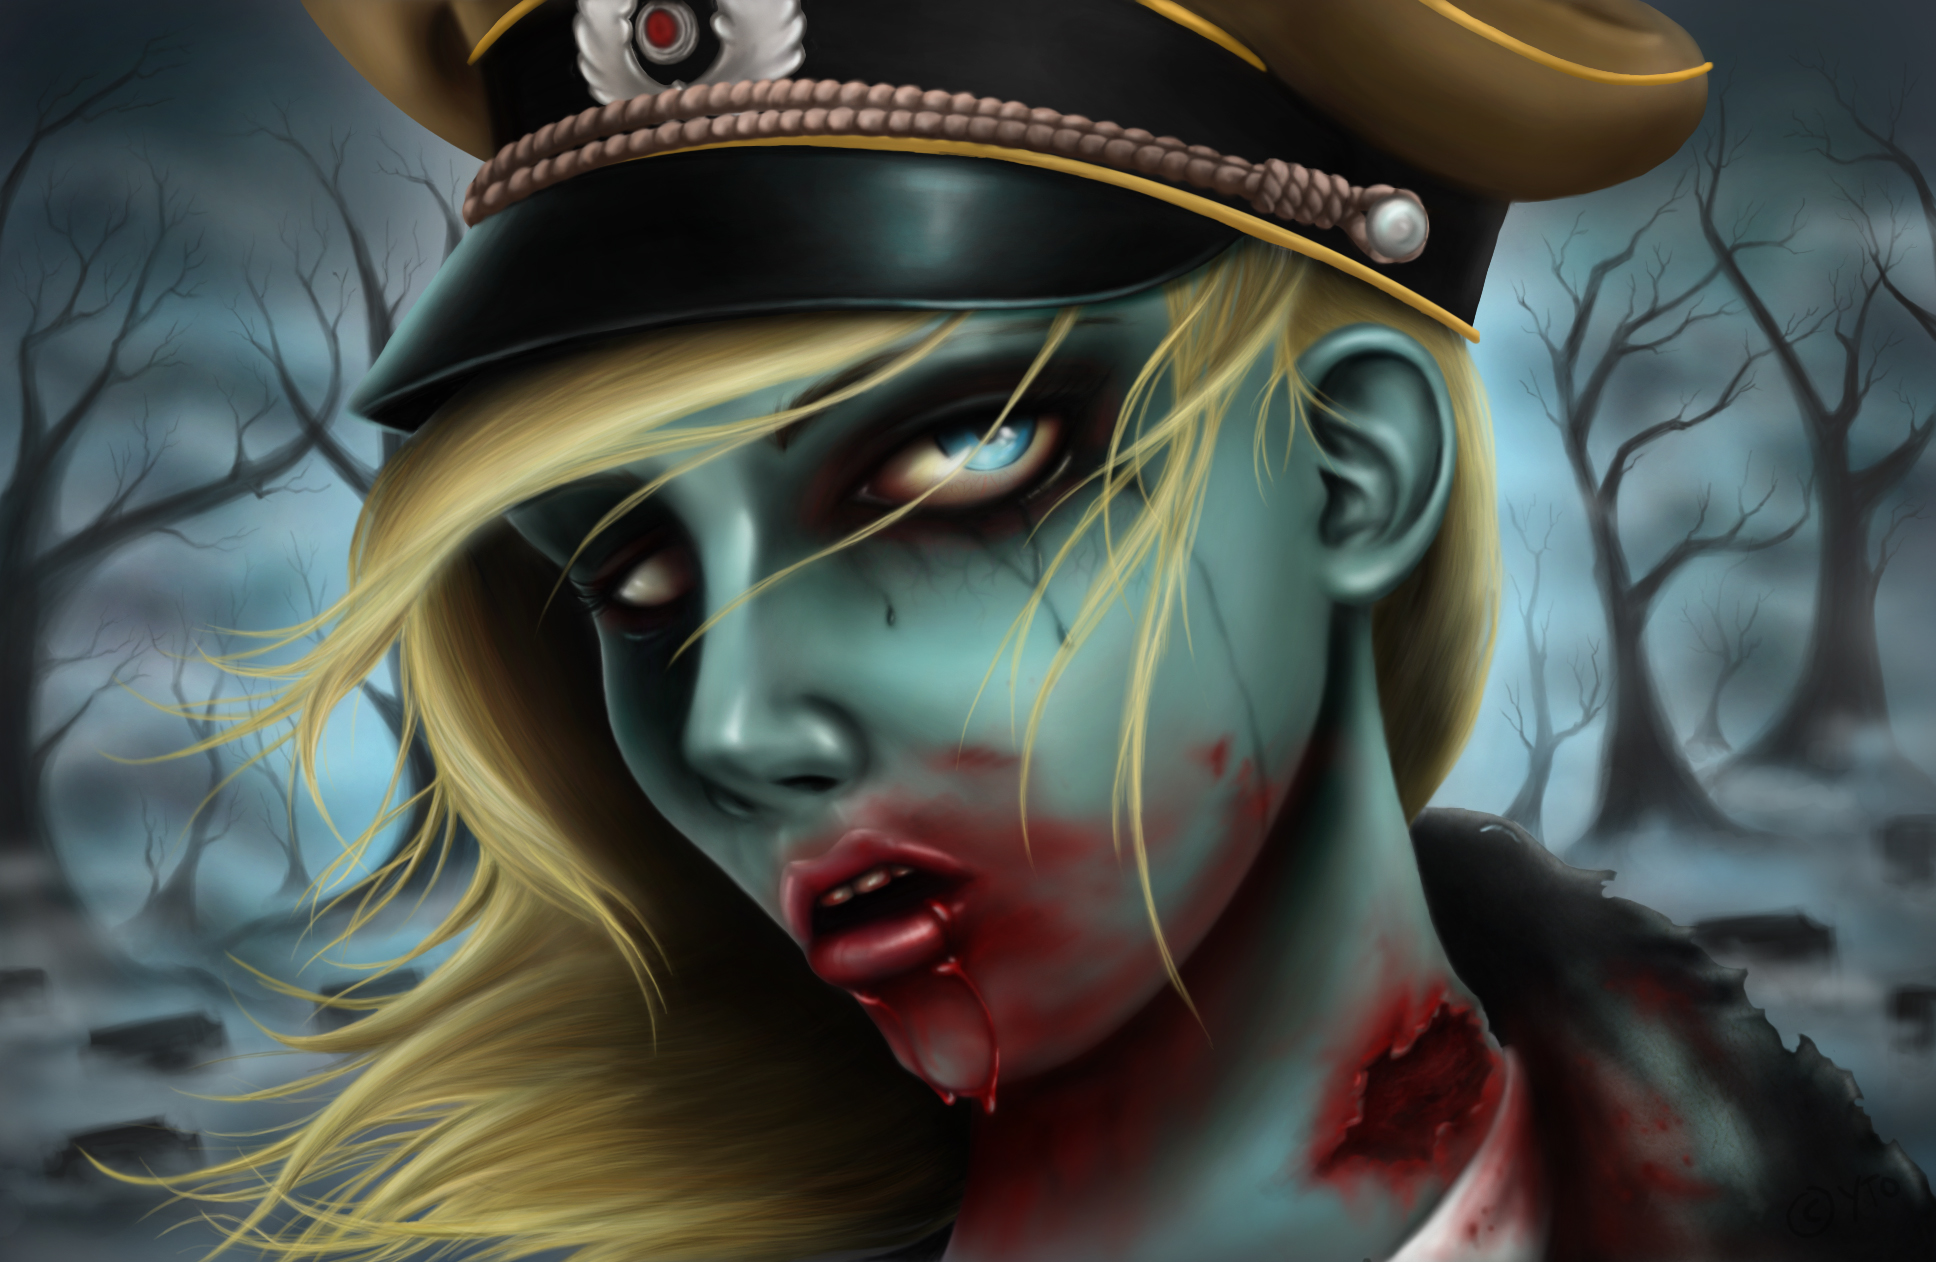 Wallpapers de zombies hd taringa - Beauti ful carteans pic hd ...